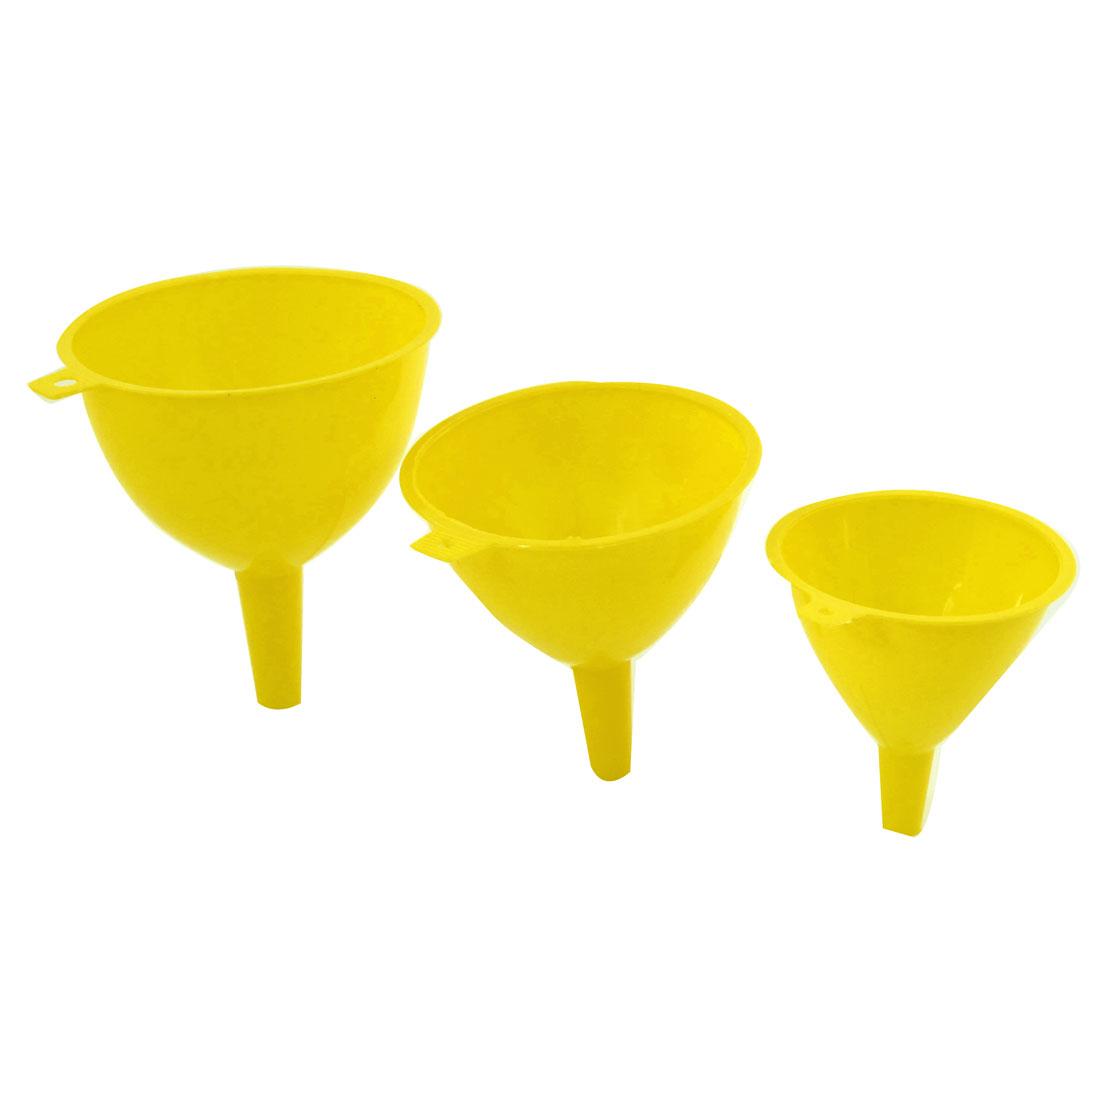 3 in 1 Kitchen Yellow Plastic 123mm 108mm 93mm Dia Water Oil Liquid Funnel Set